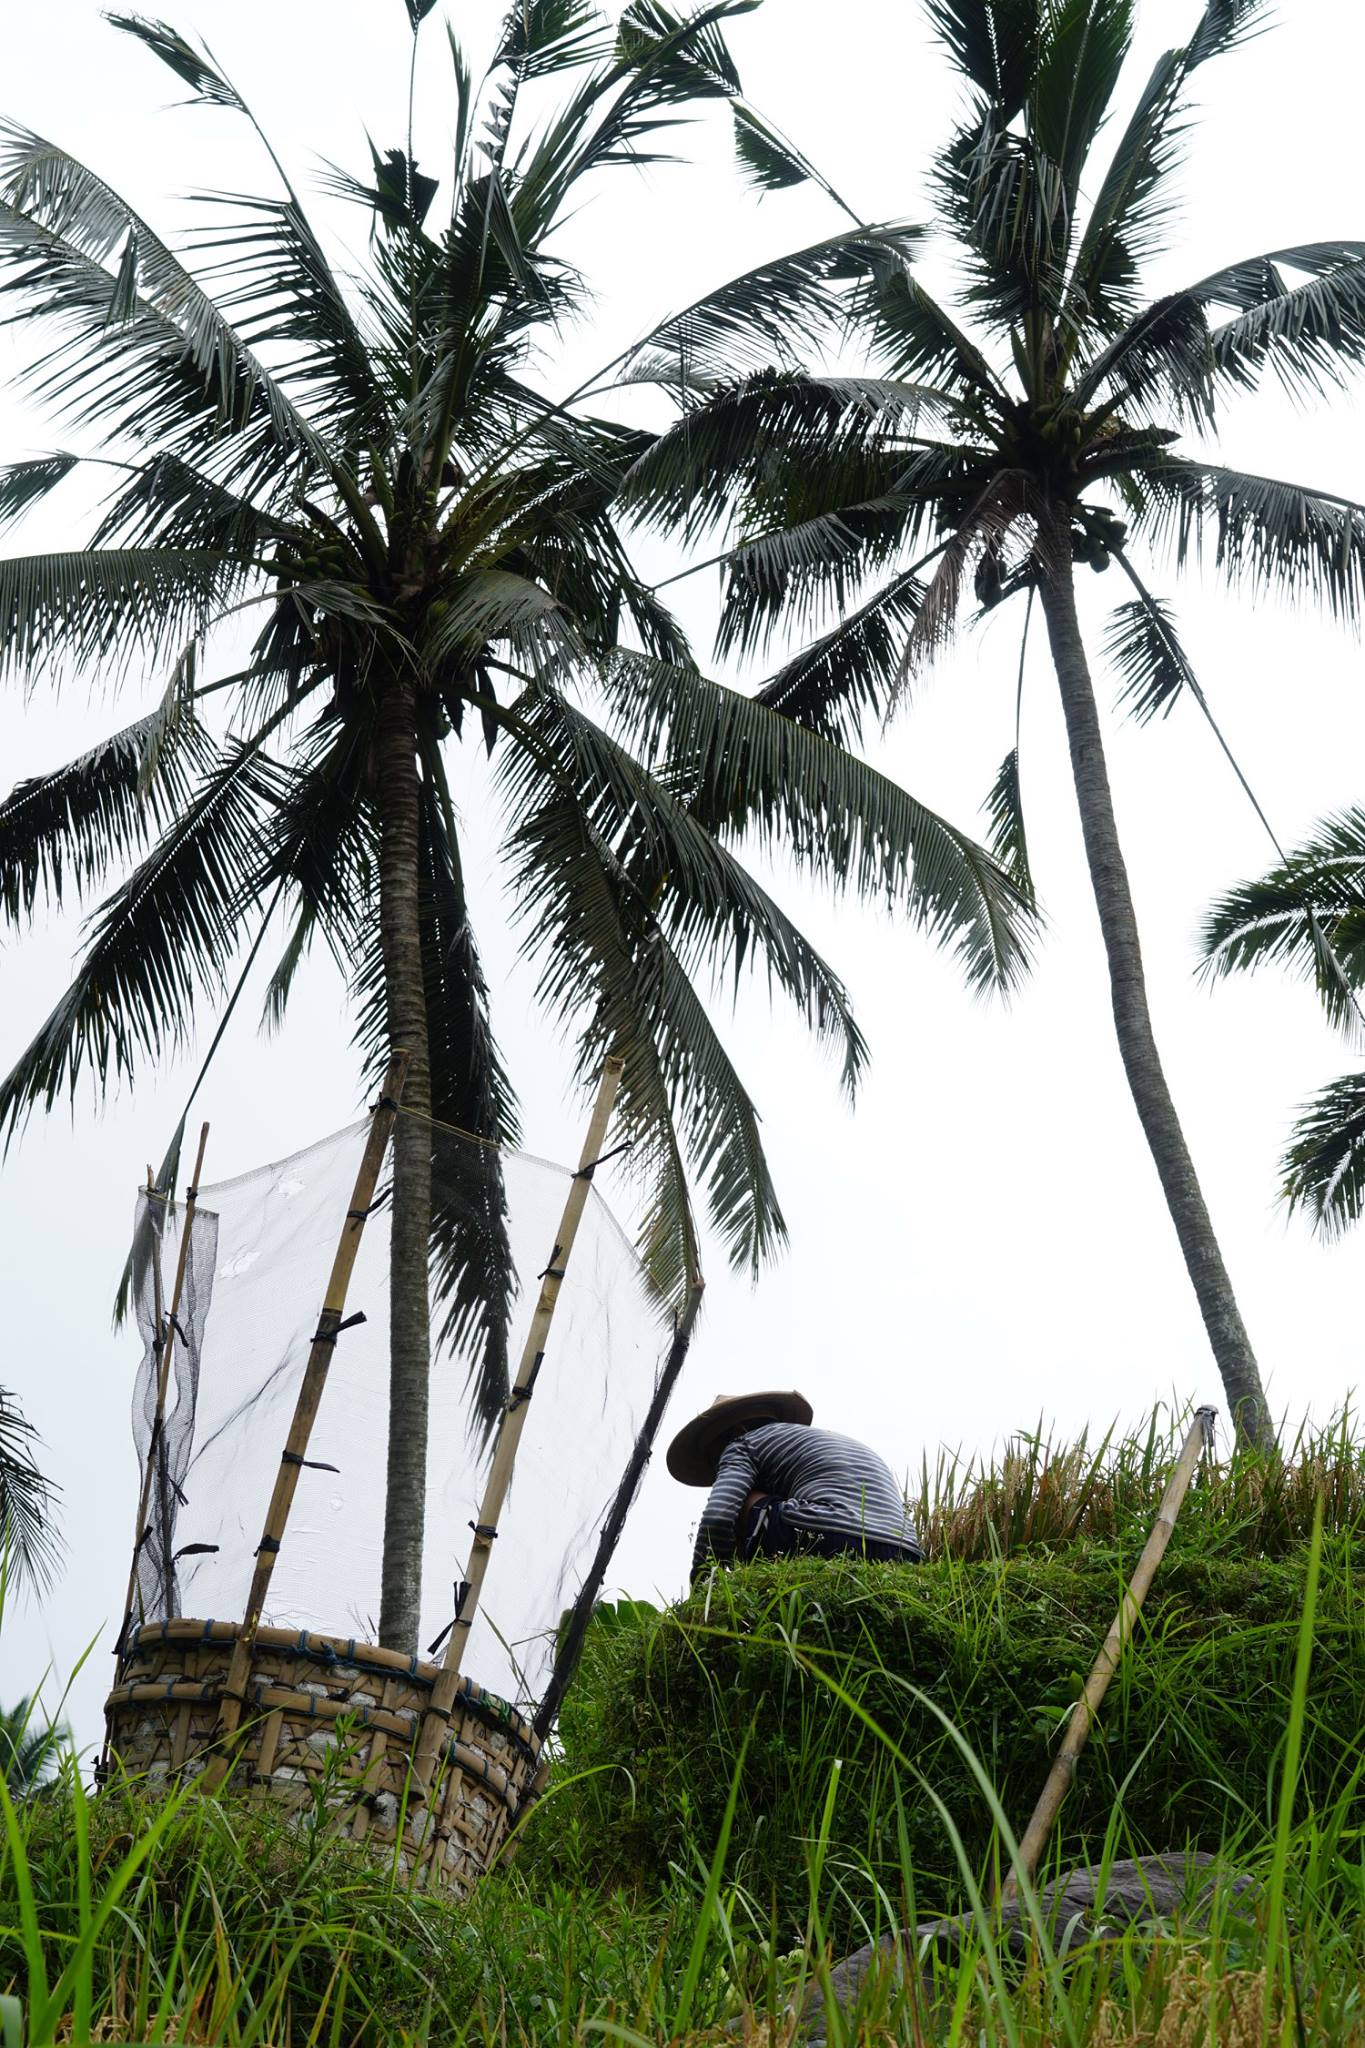 Palm tree in Bali